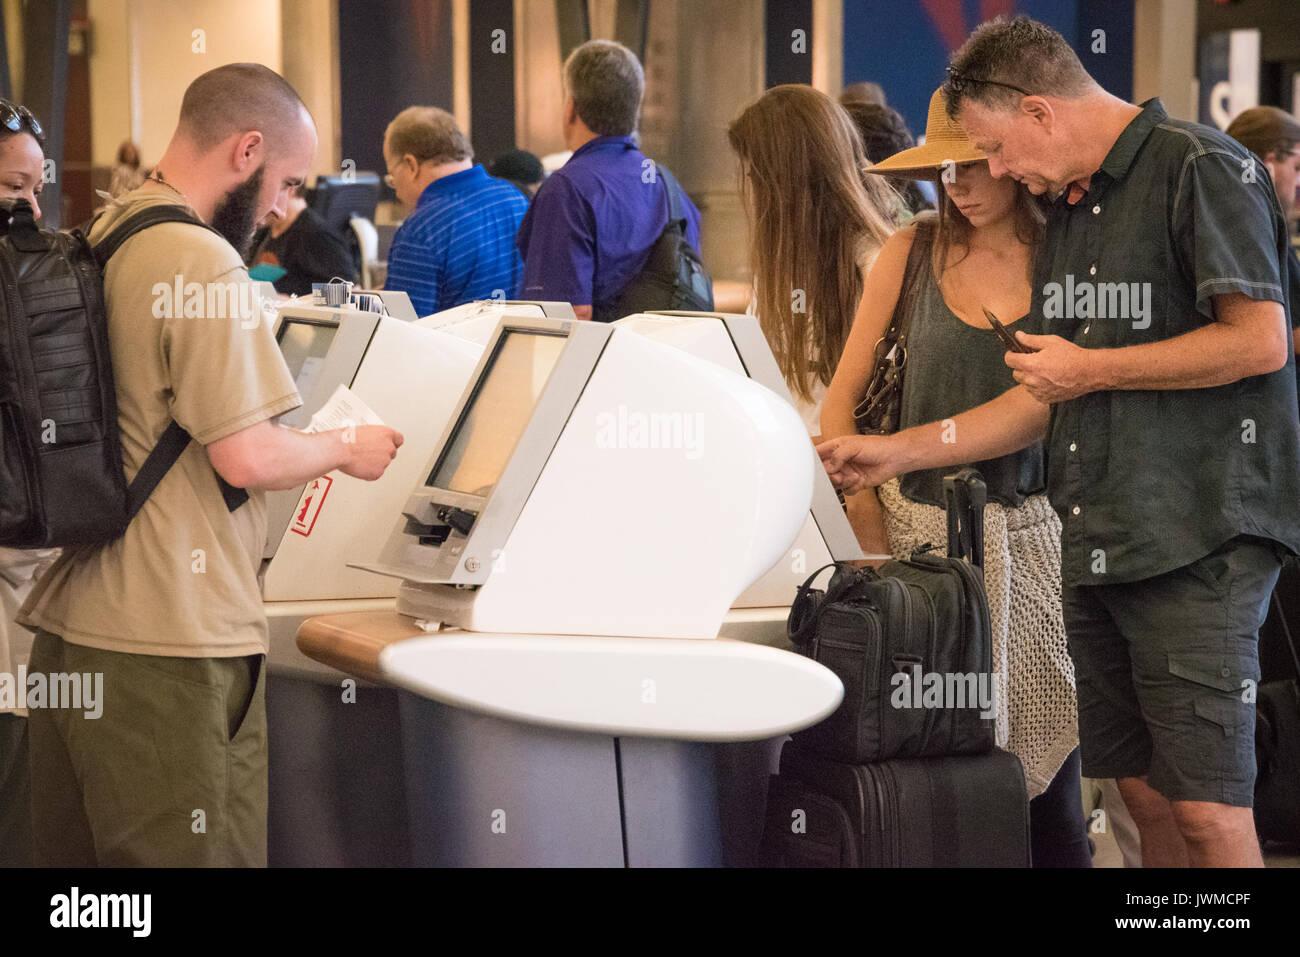 Delta Air Lines Passengers At Atlanta International Airport Using